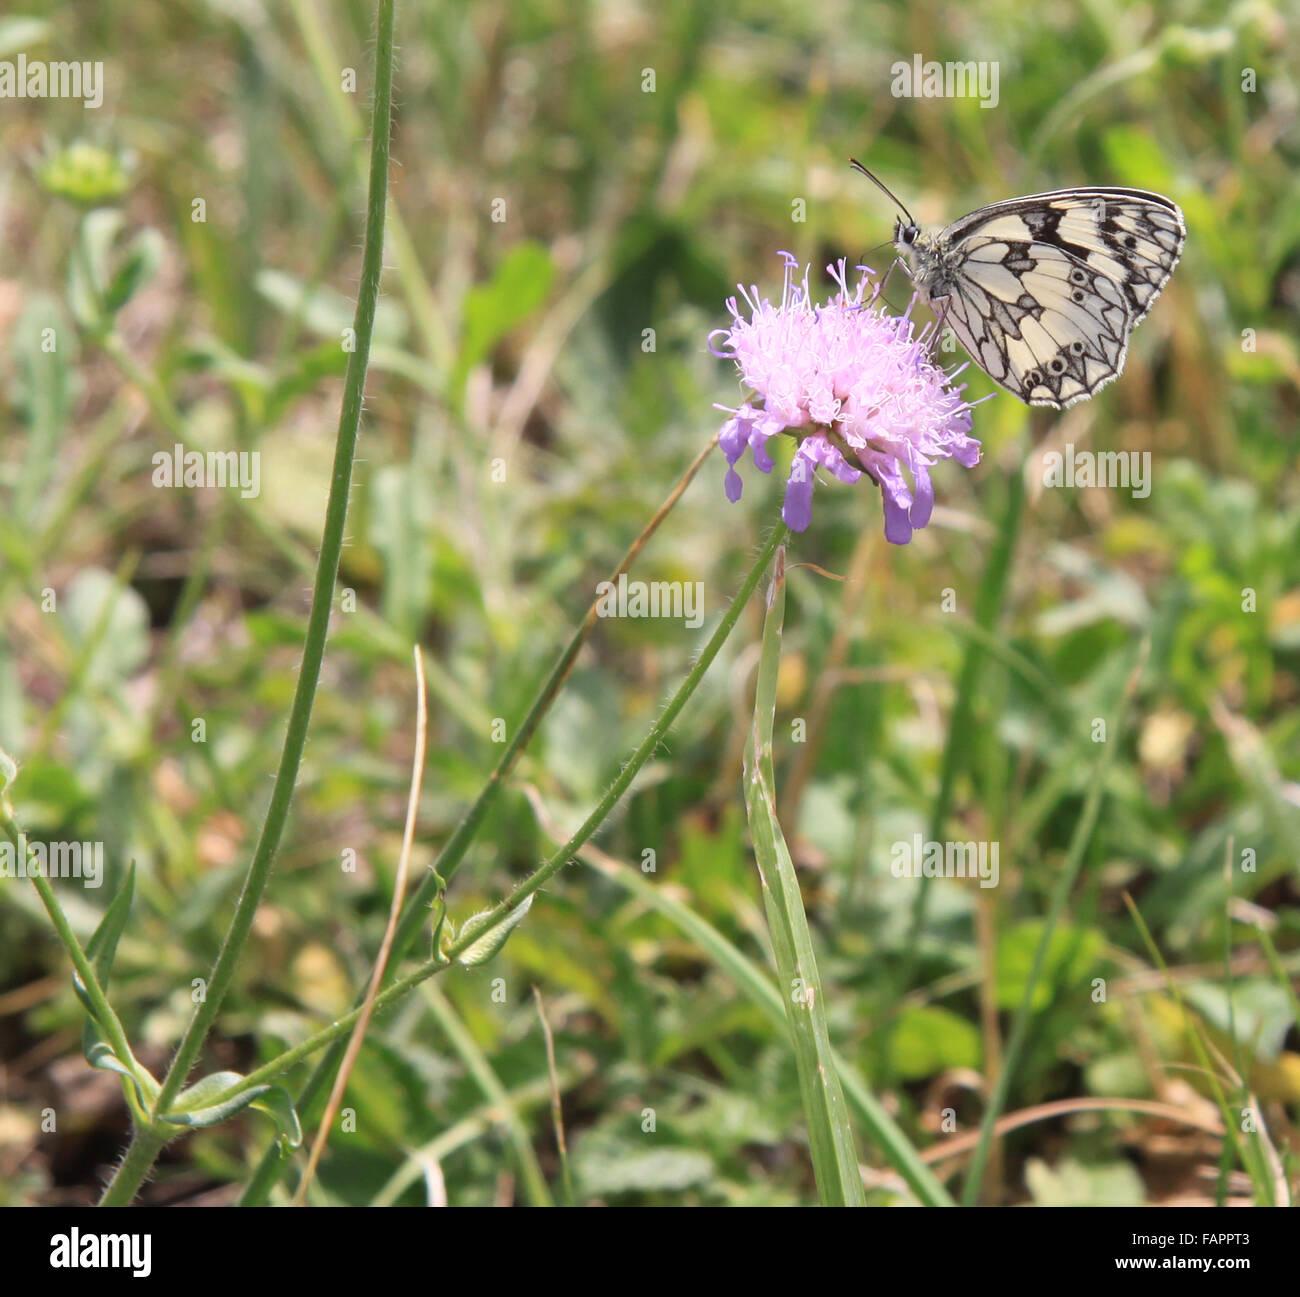 Marbled White Melanargia galathea butterfly on Knapweed flower England Stock Photo